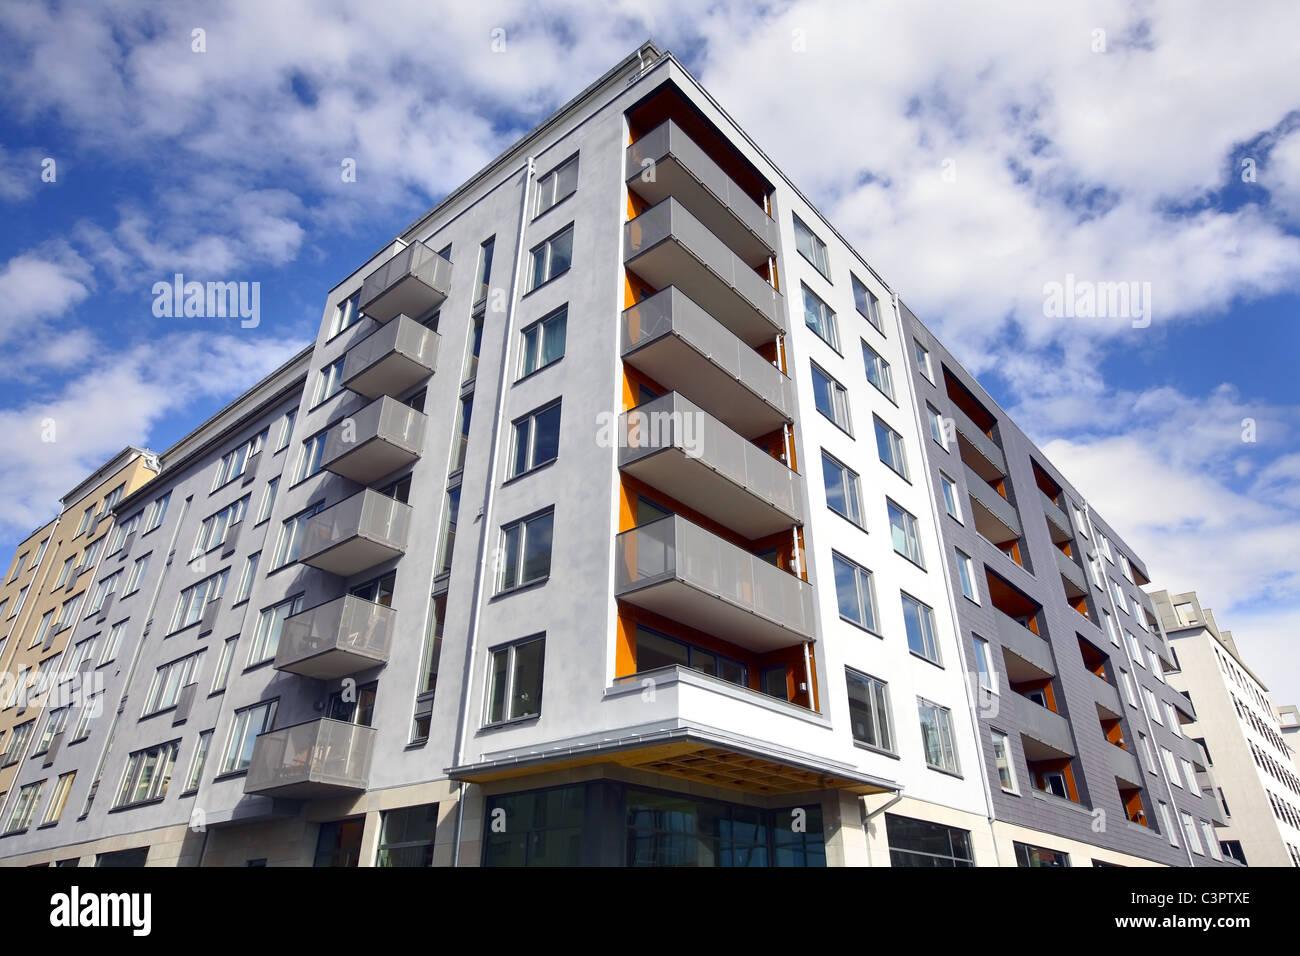 Immeuble en Suède Photo Stock